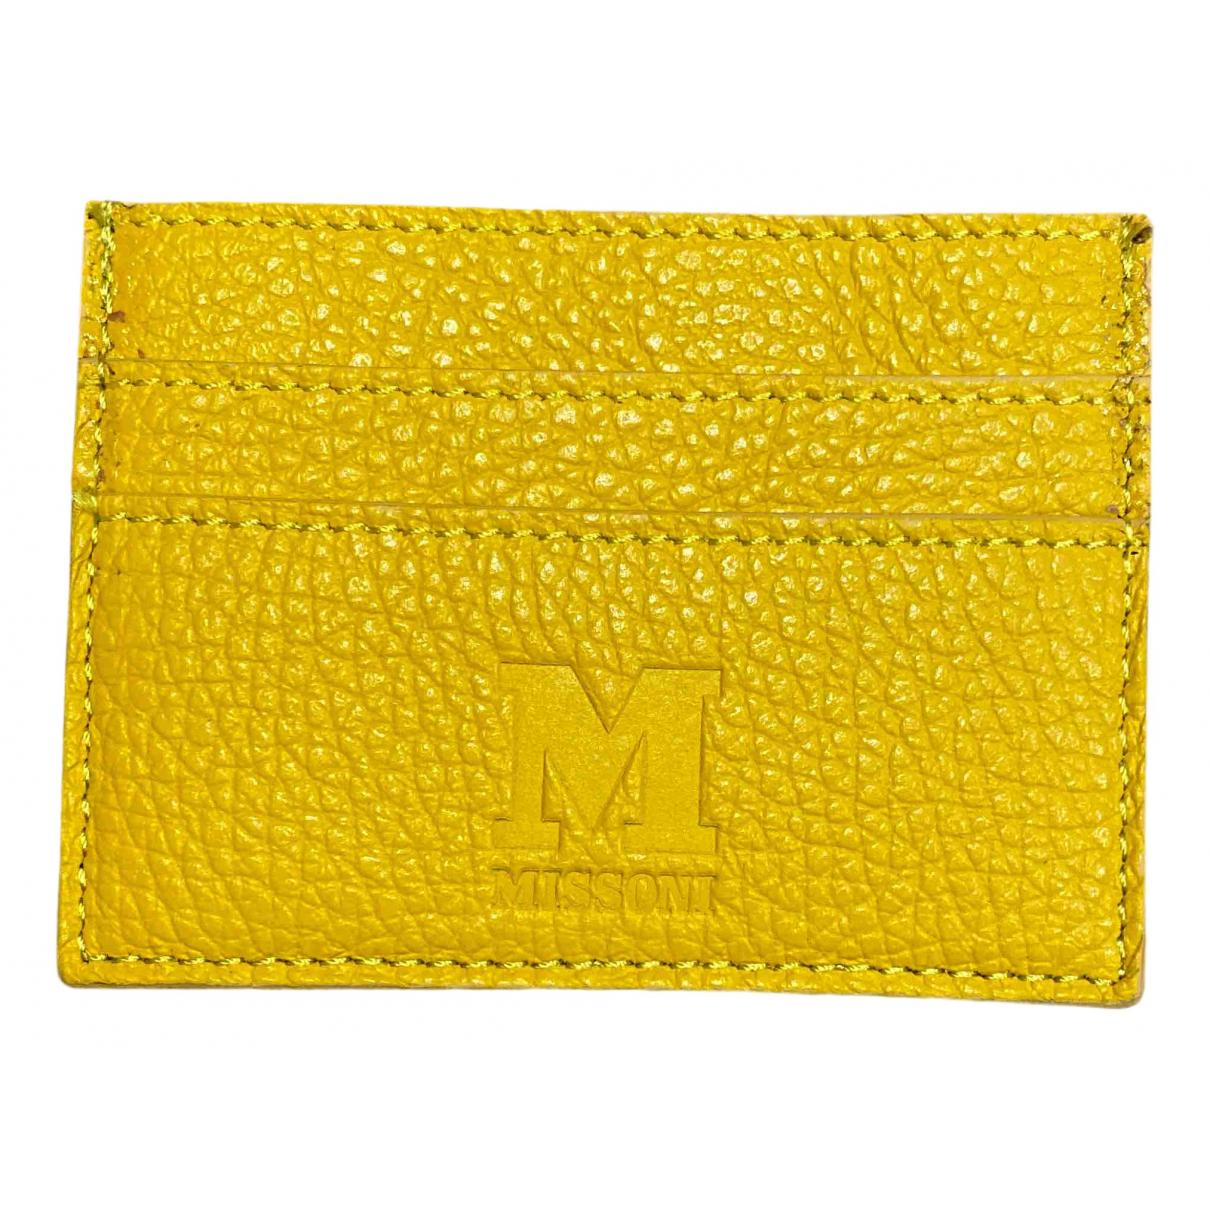 M Missoni - Petite maroquinerie   pour femme en cuir - jaune